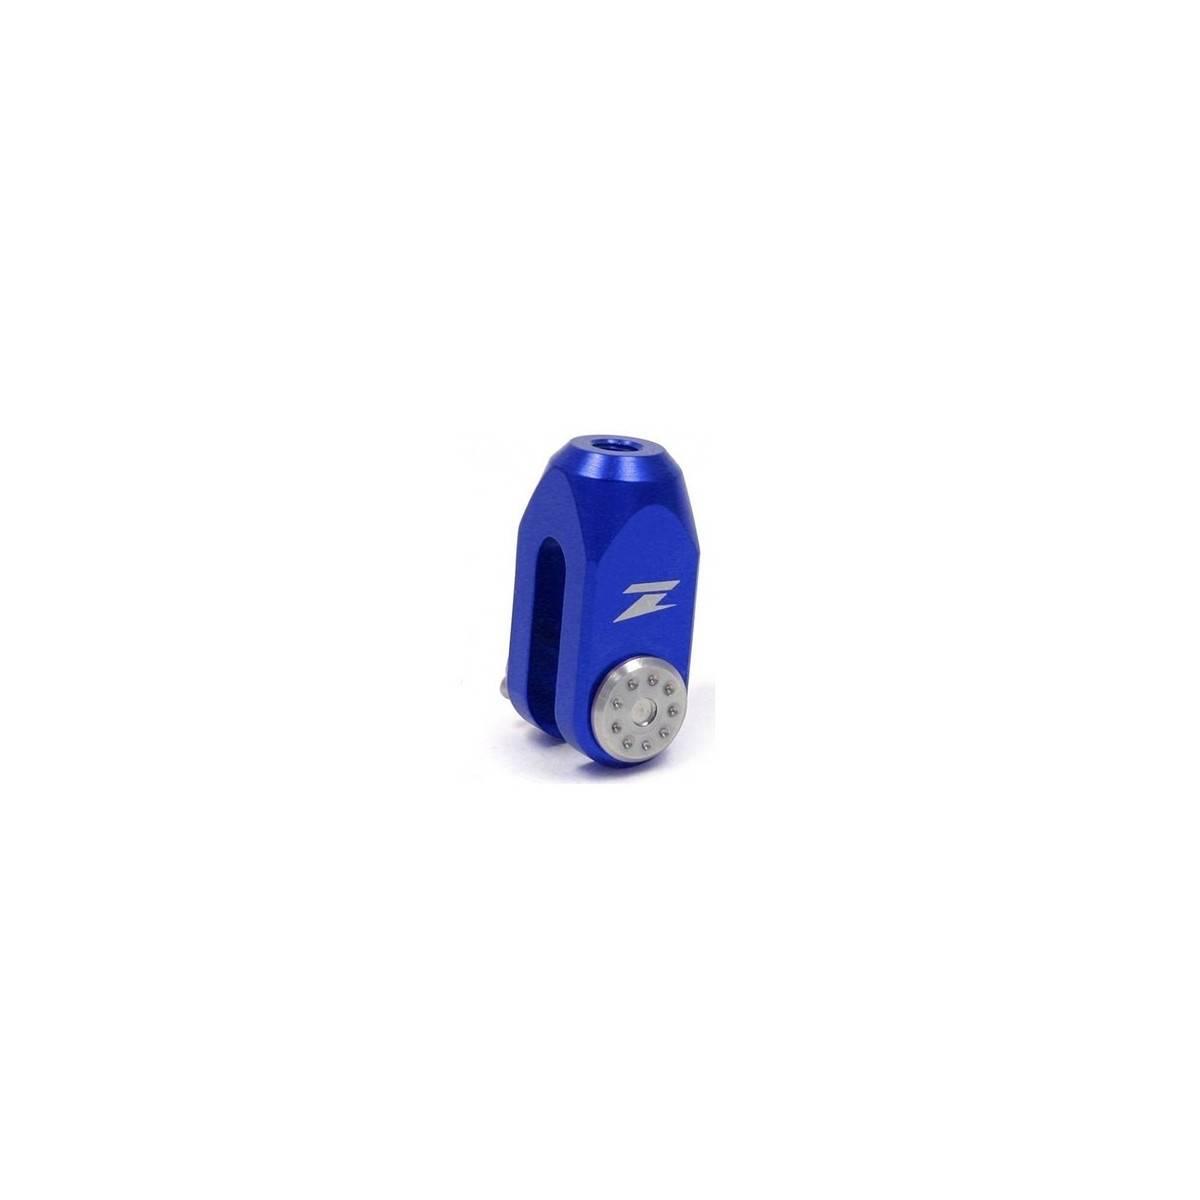 ZE94.0682 - Leva Cable Embrague Zeta Wr250R X ´07 Azul